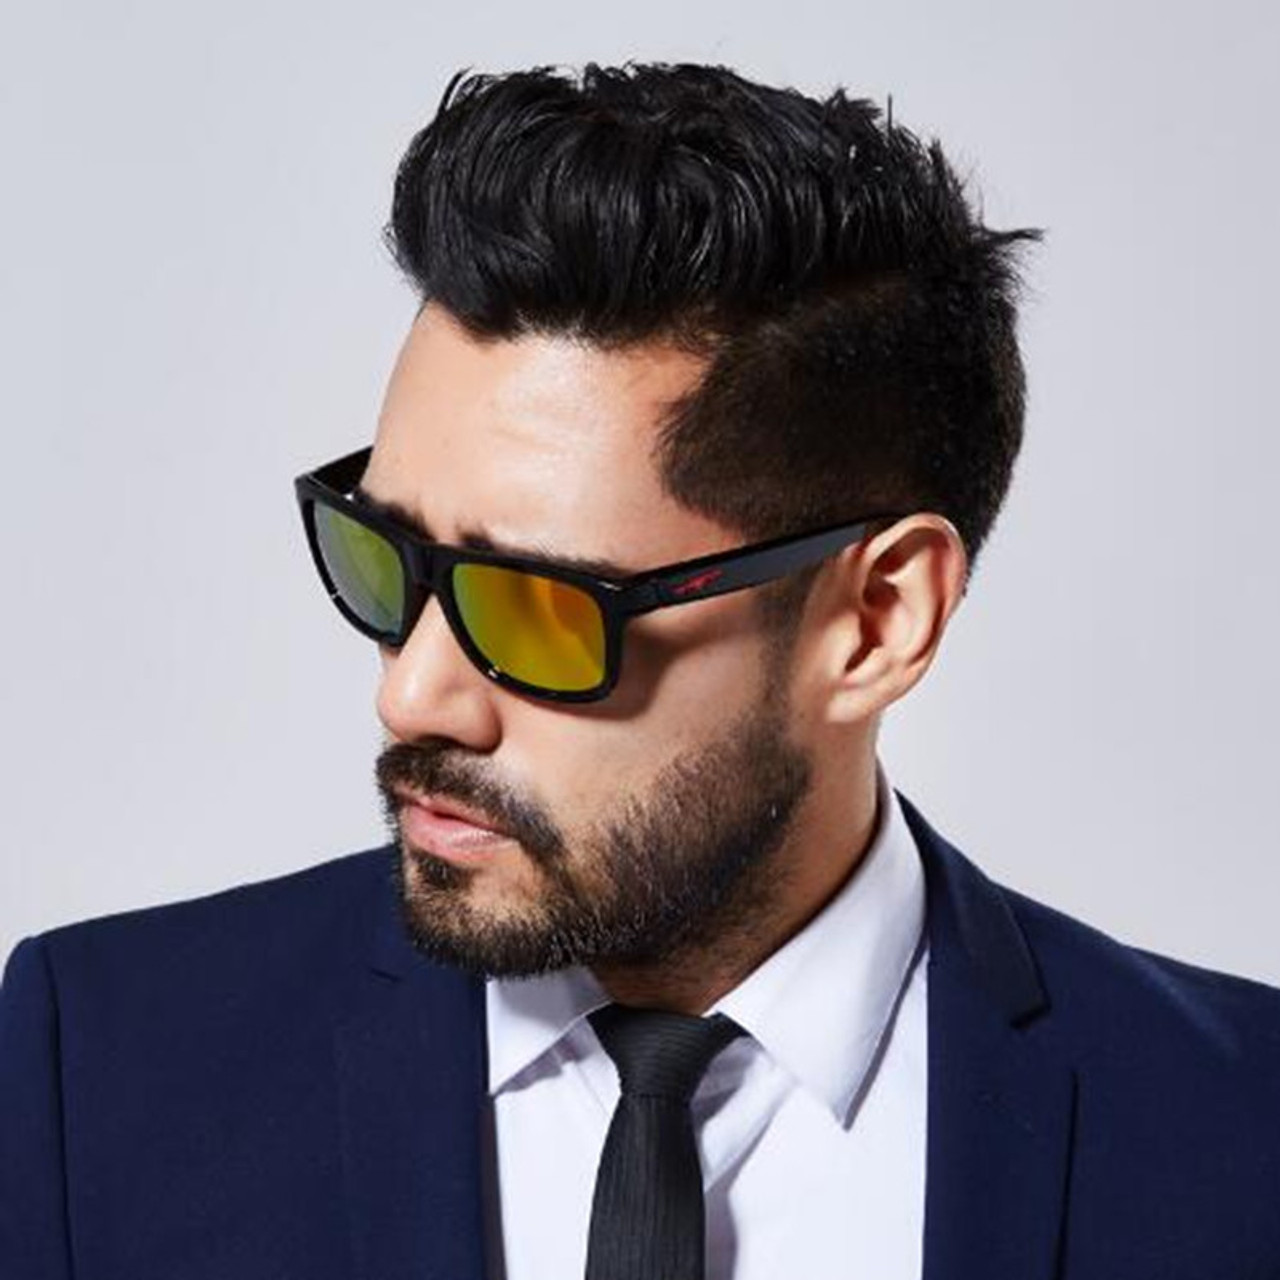 bea84e57753 ... 2018 Arnette Sunglasses Men Sun Glasses Driving UV400 Vintage Motion  Sunglass Women gafas de sol de ...